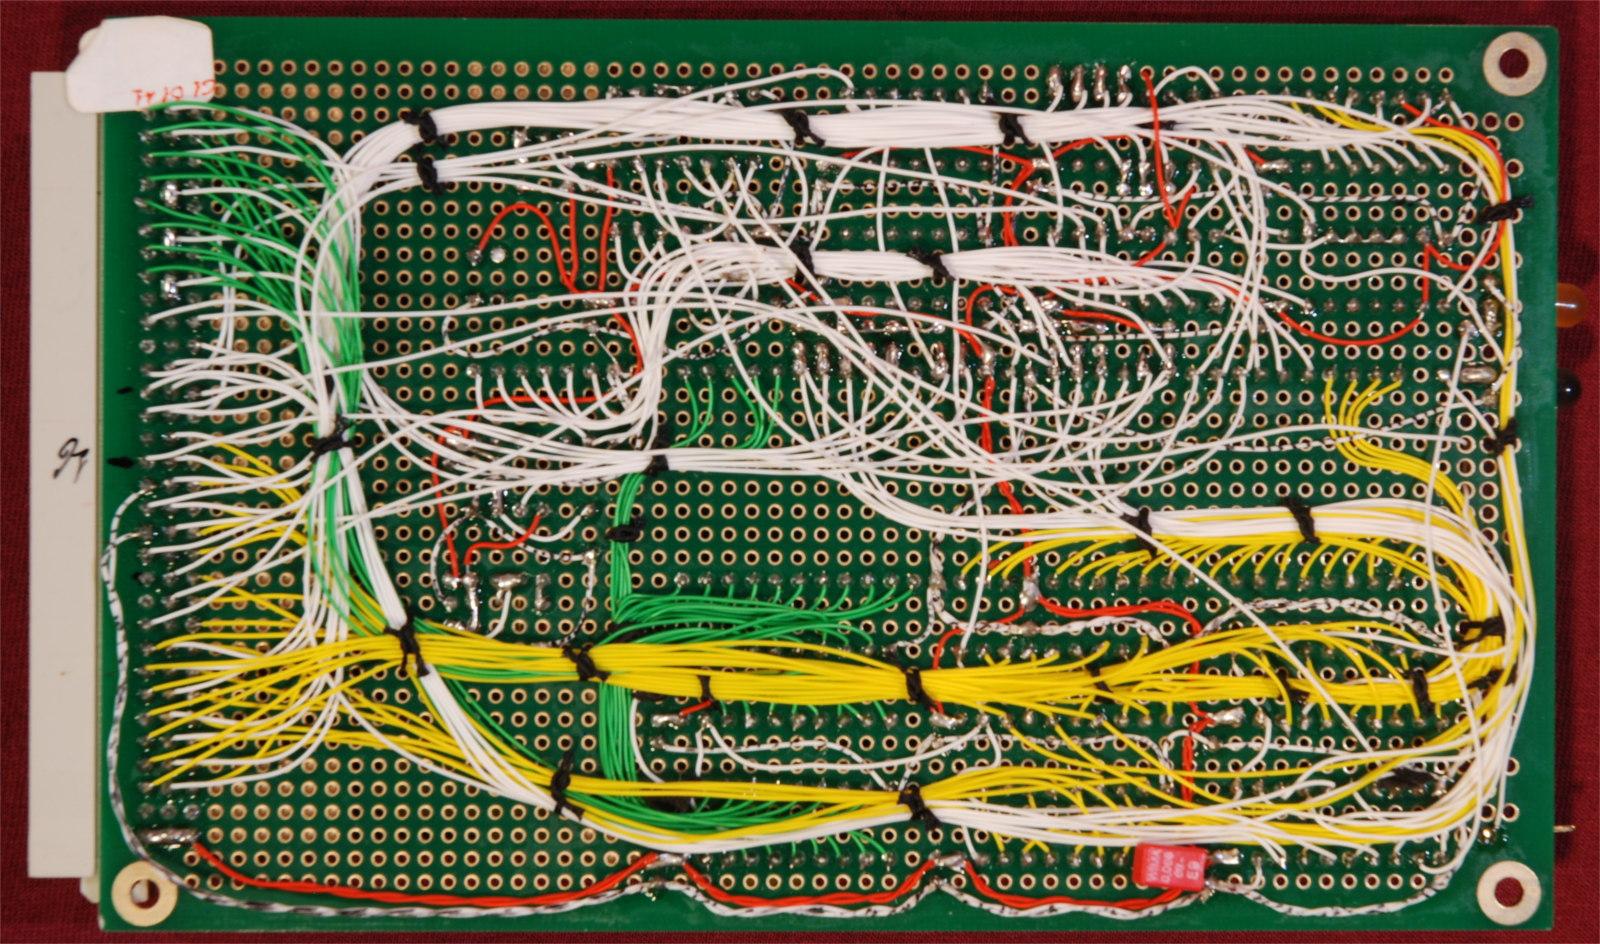 Kira 68010 computer. Scheda CPU.